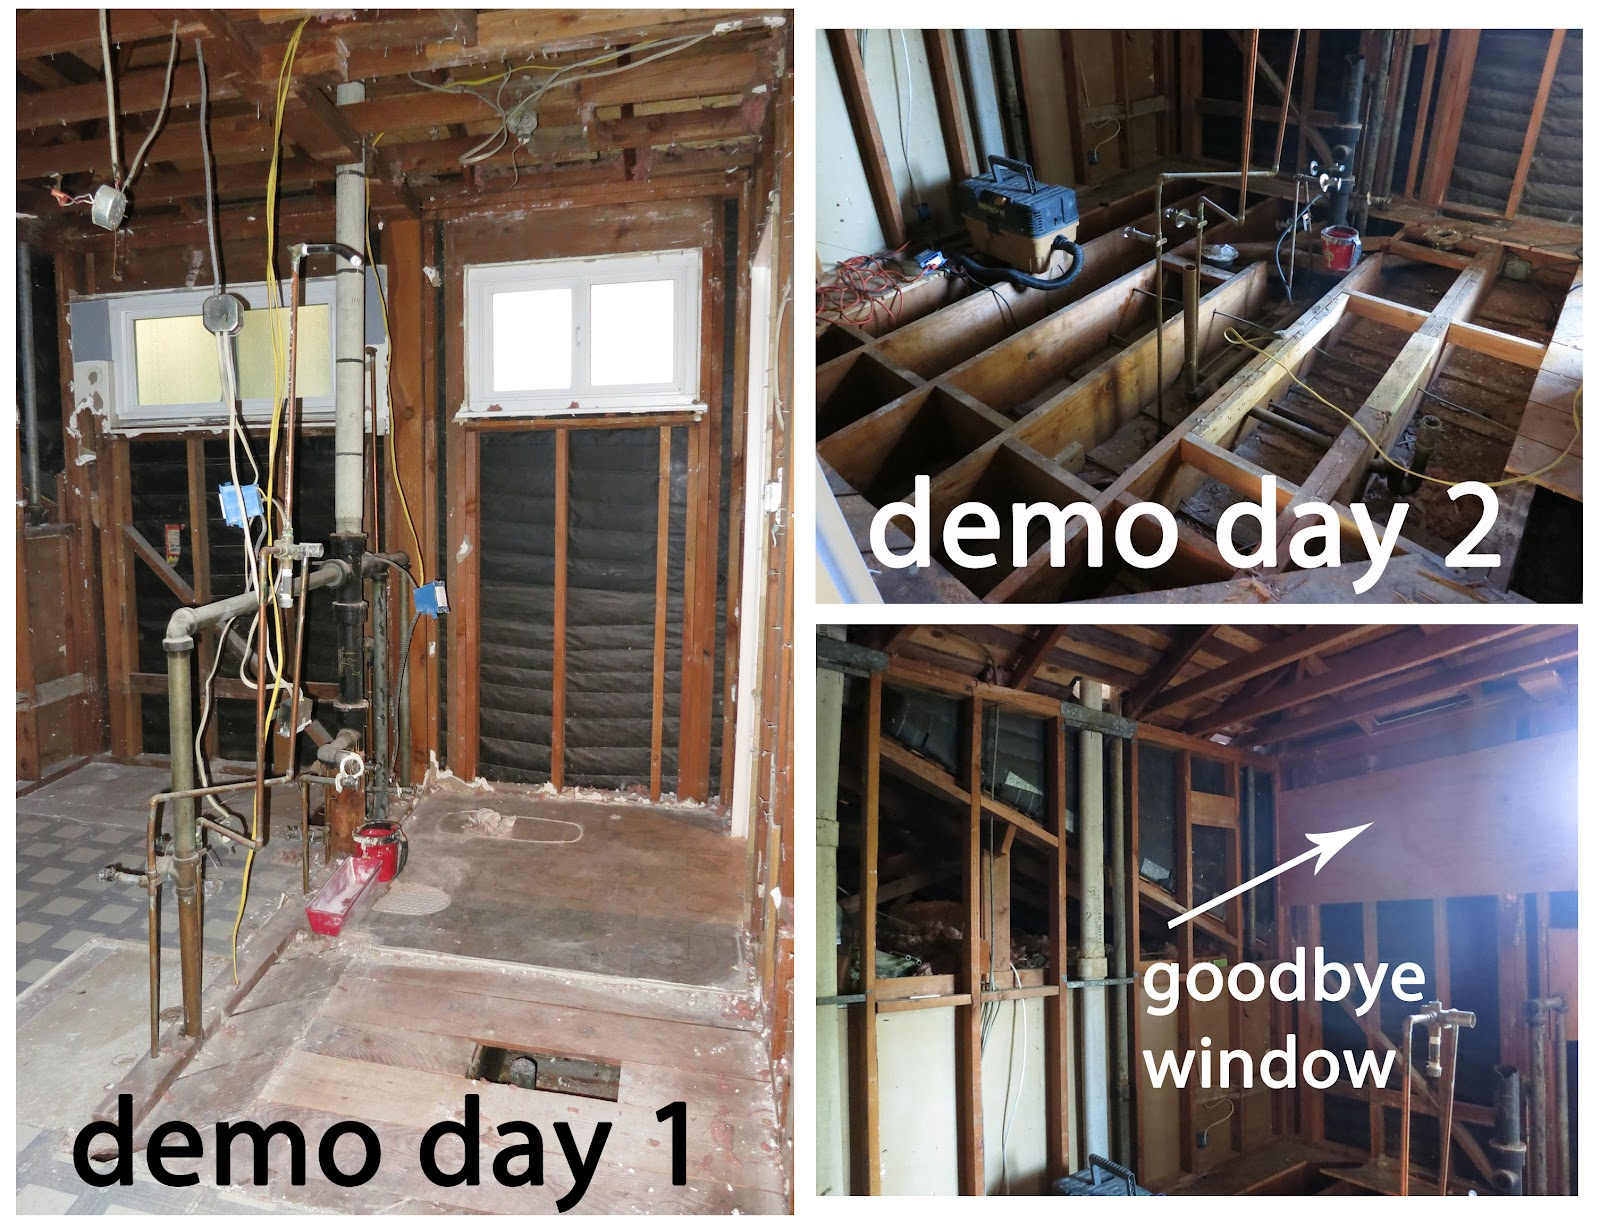 The new mrs honda bathroom remodel demo days for Bathroom remodel in 3 days